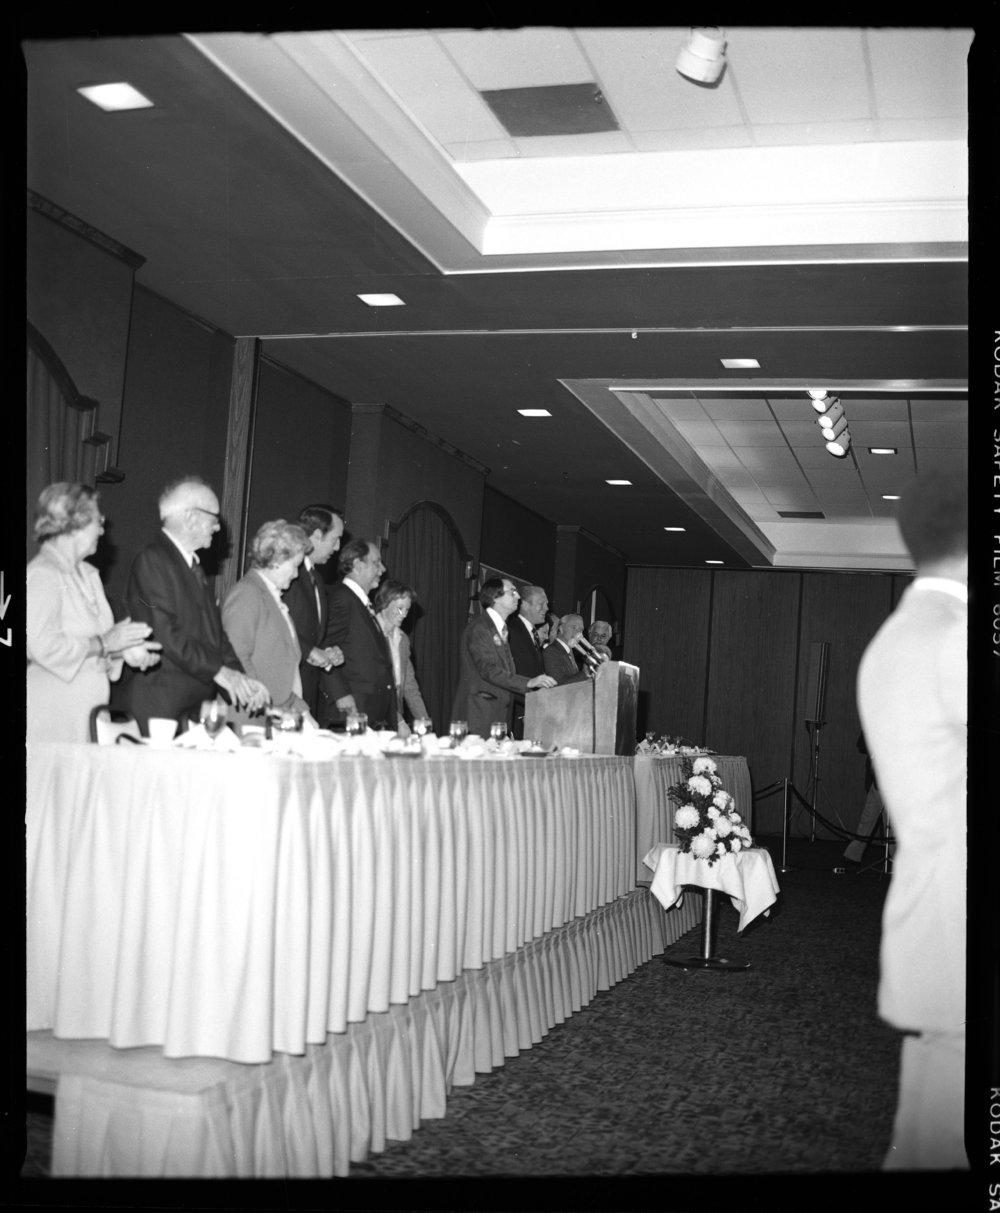 Nancy Landon Kassebaum with other Republican politicians, Topeka, Kansas - 5